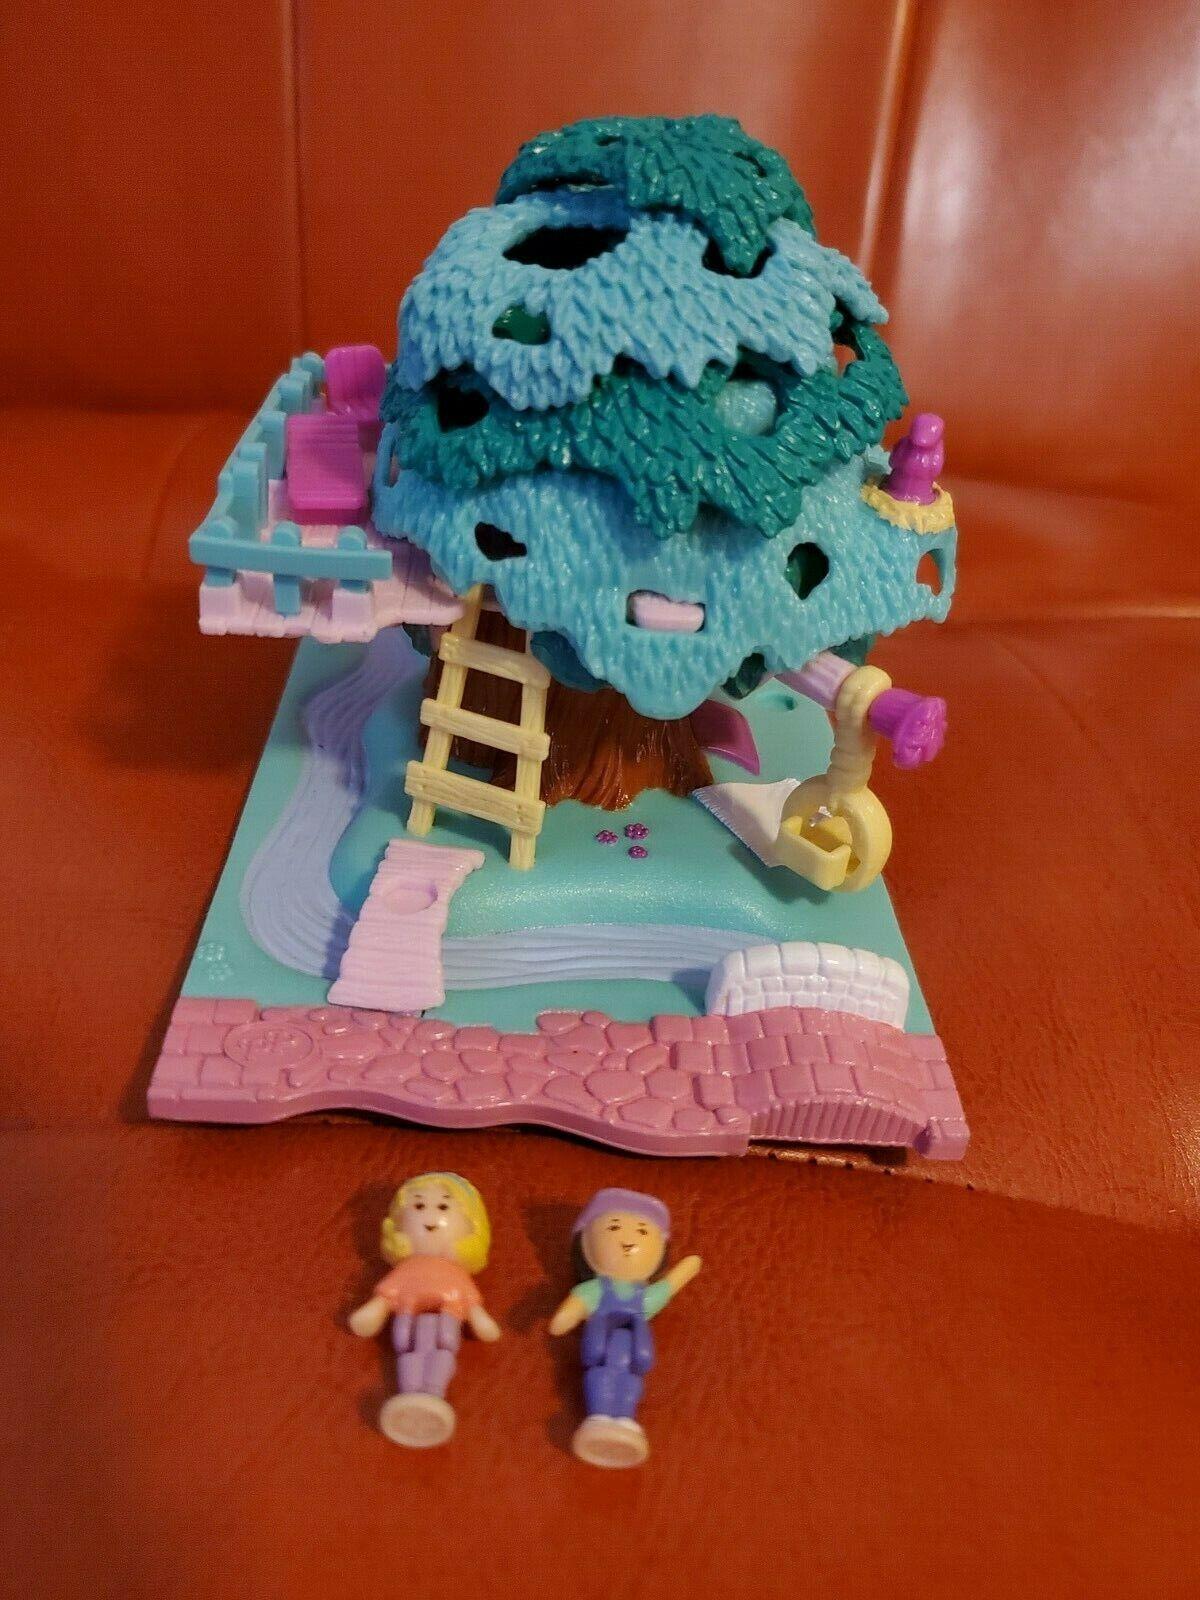 Vintage 1994 Polly Pocket Tree House - $45.00